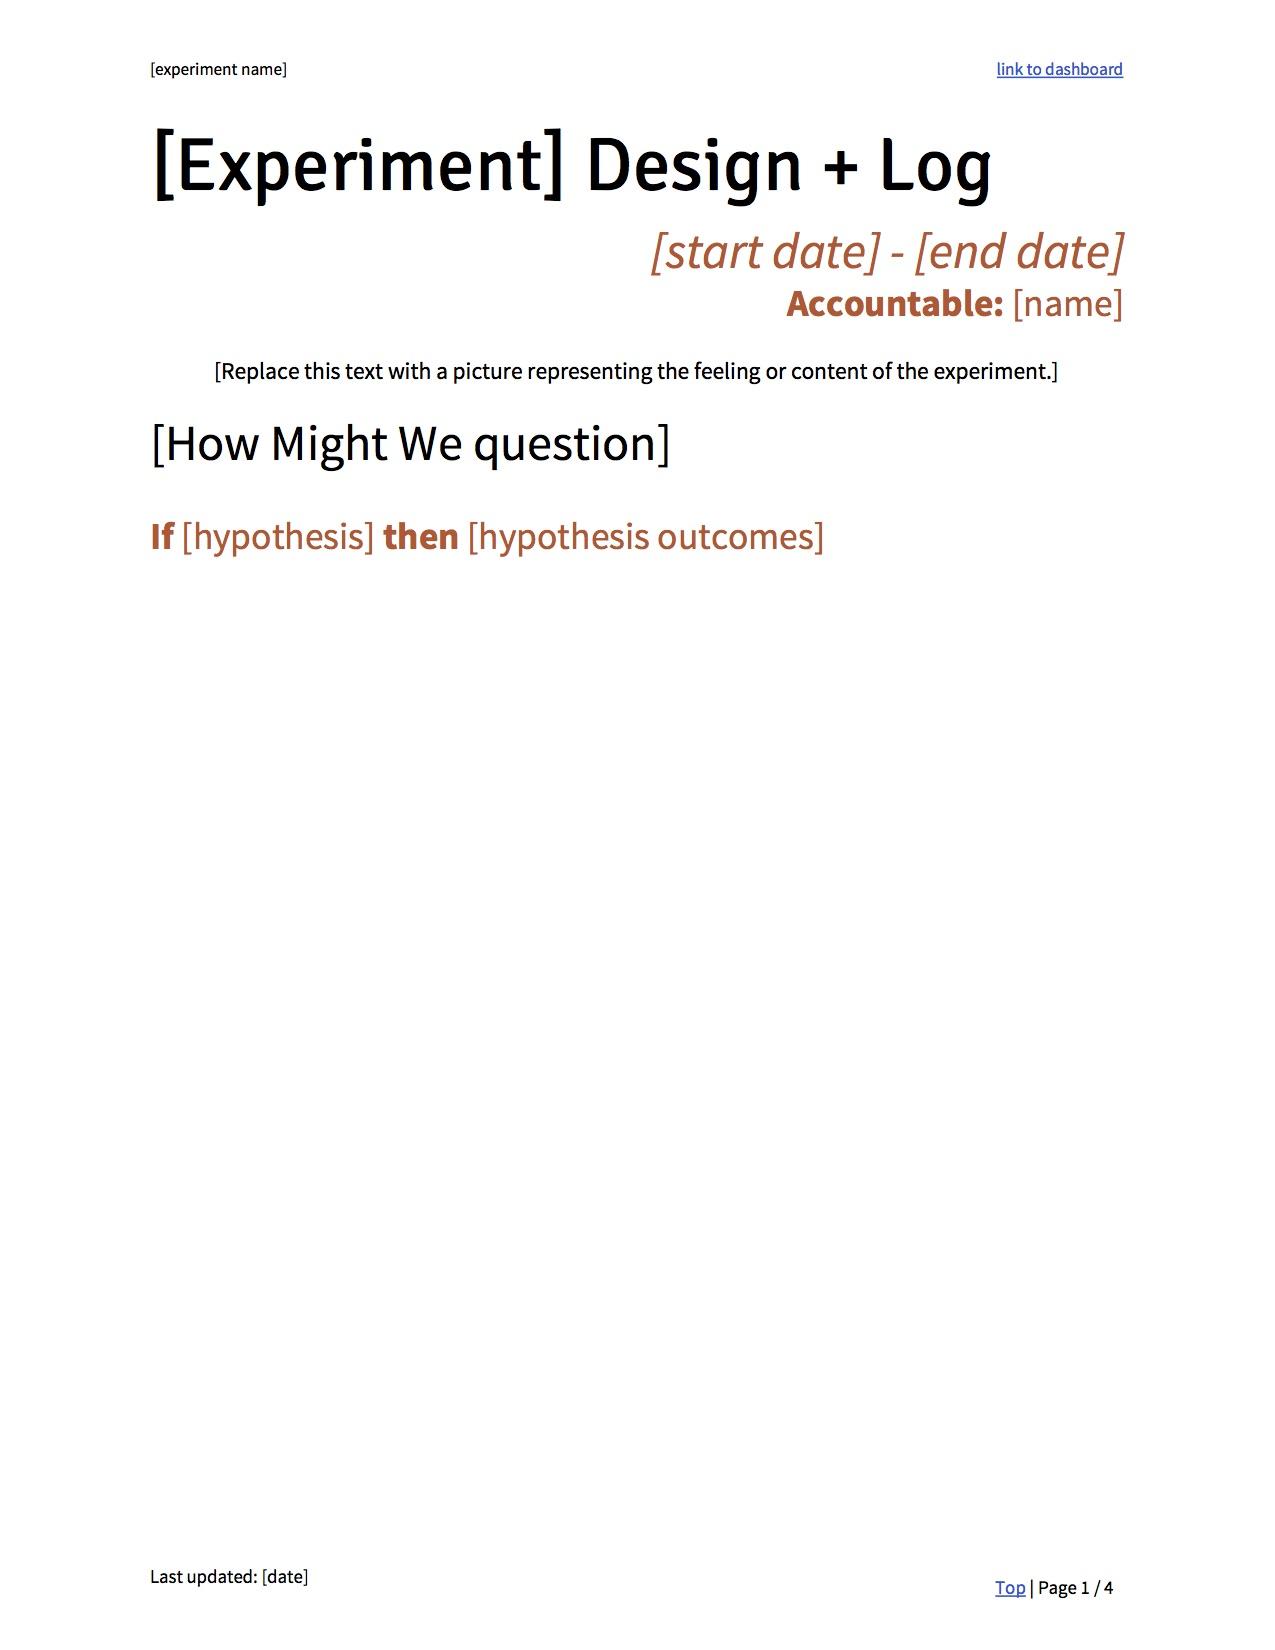 Experimentation Template: Design + Log